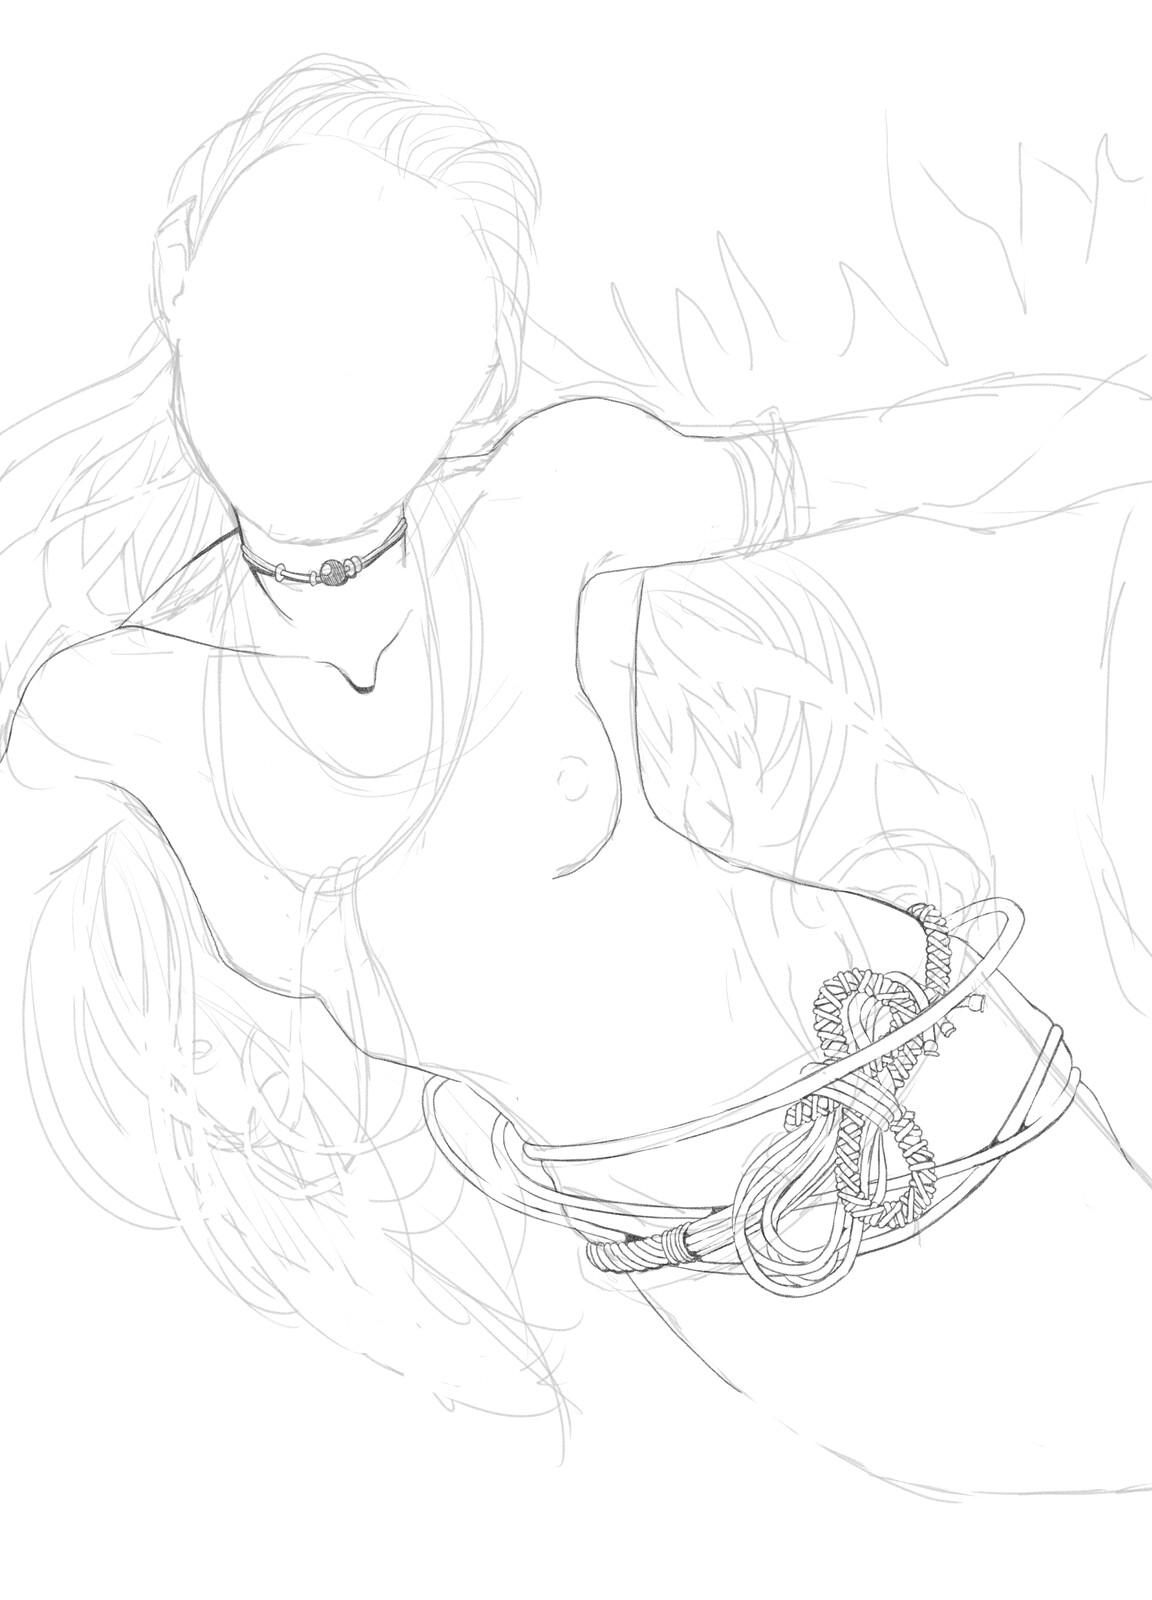 Process sketch 1